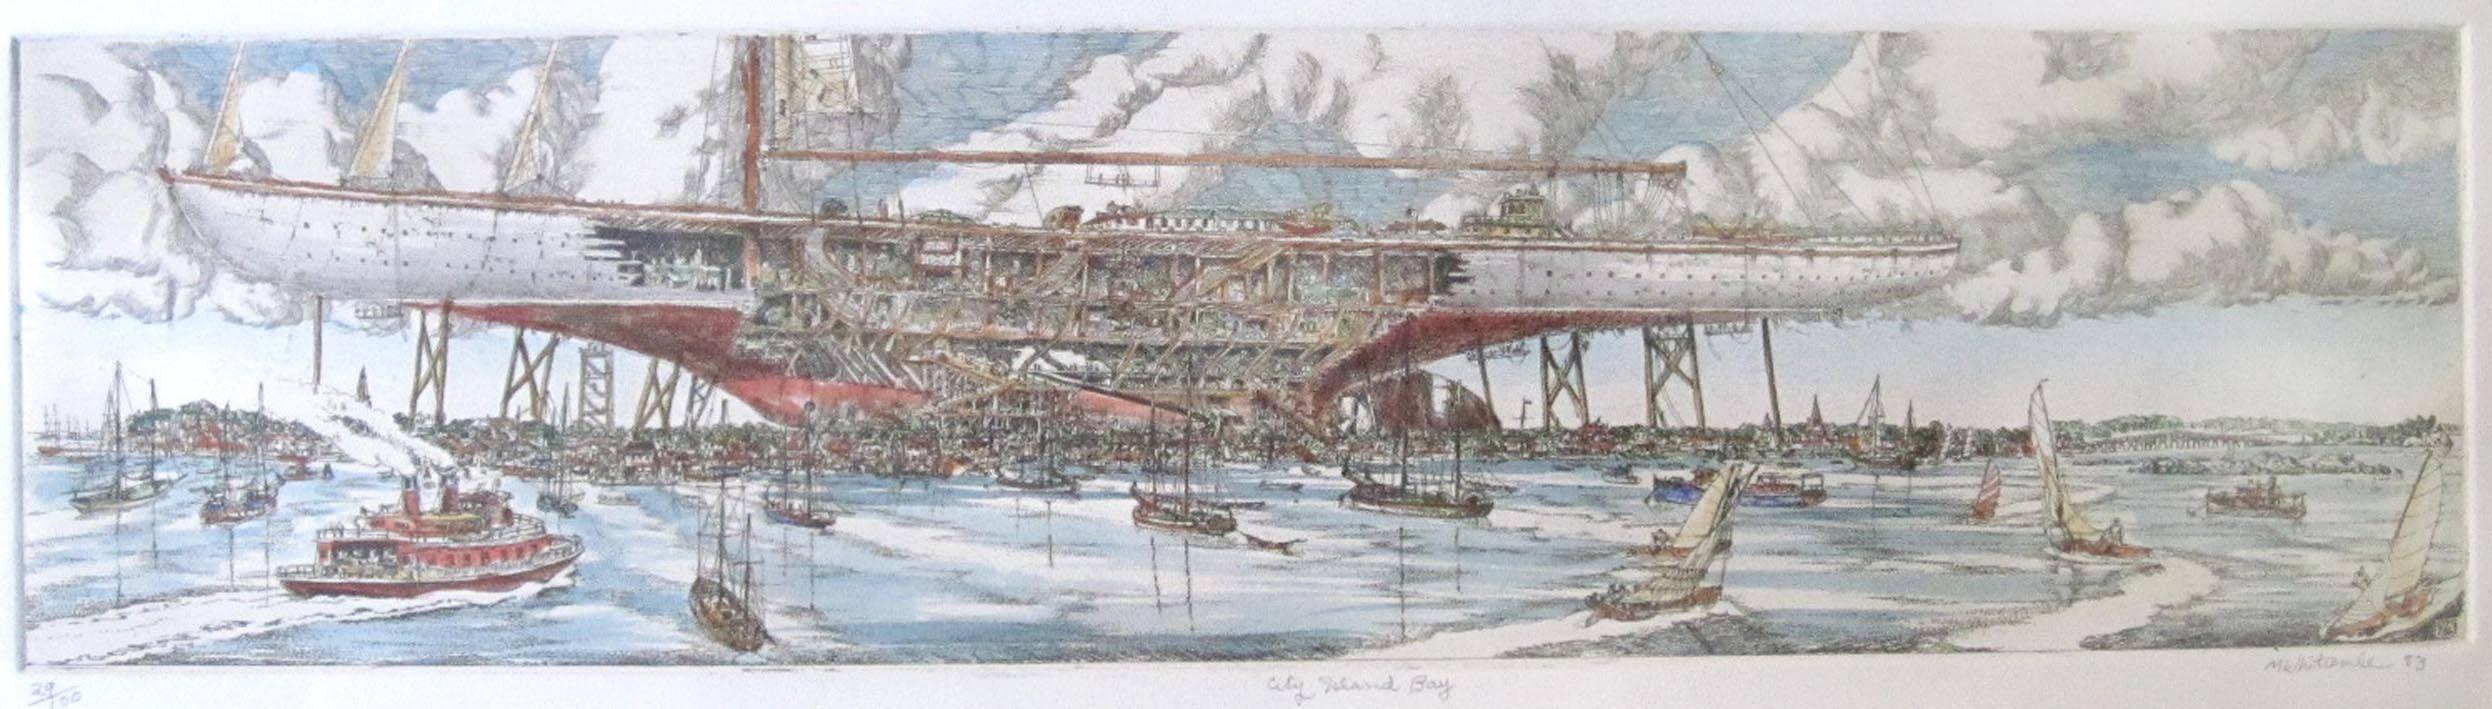 City Island Bay